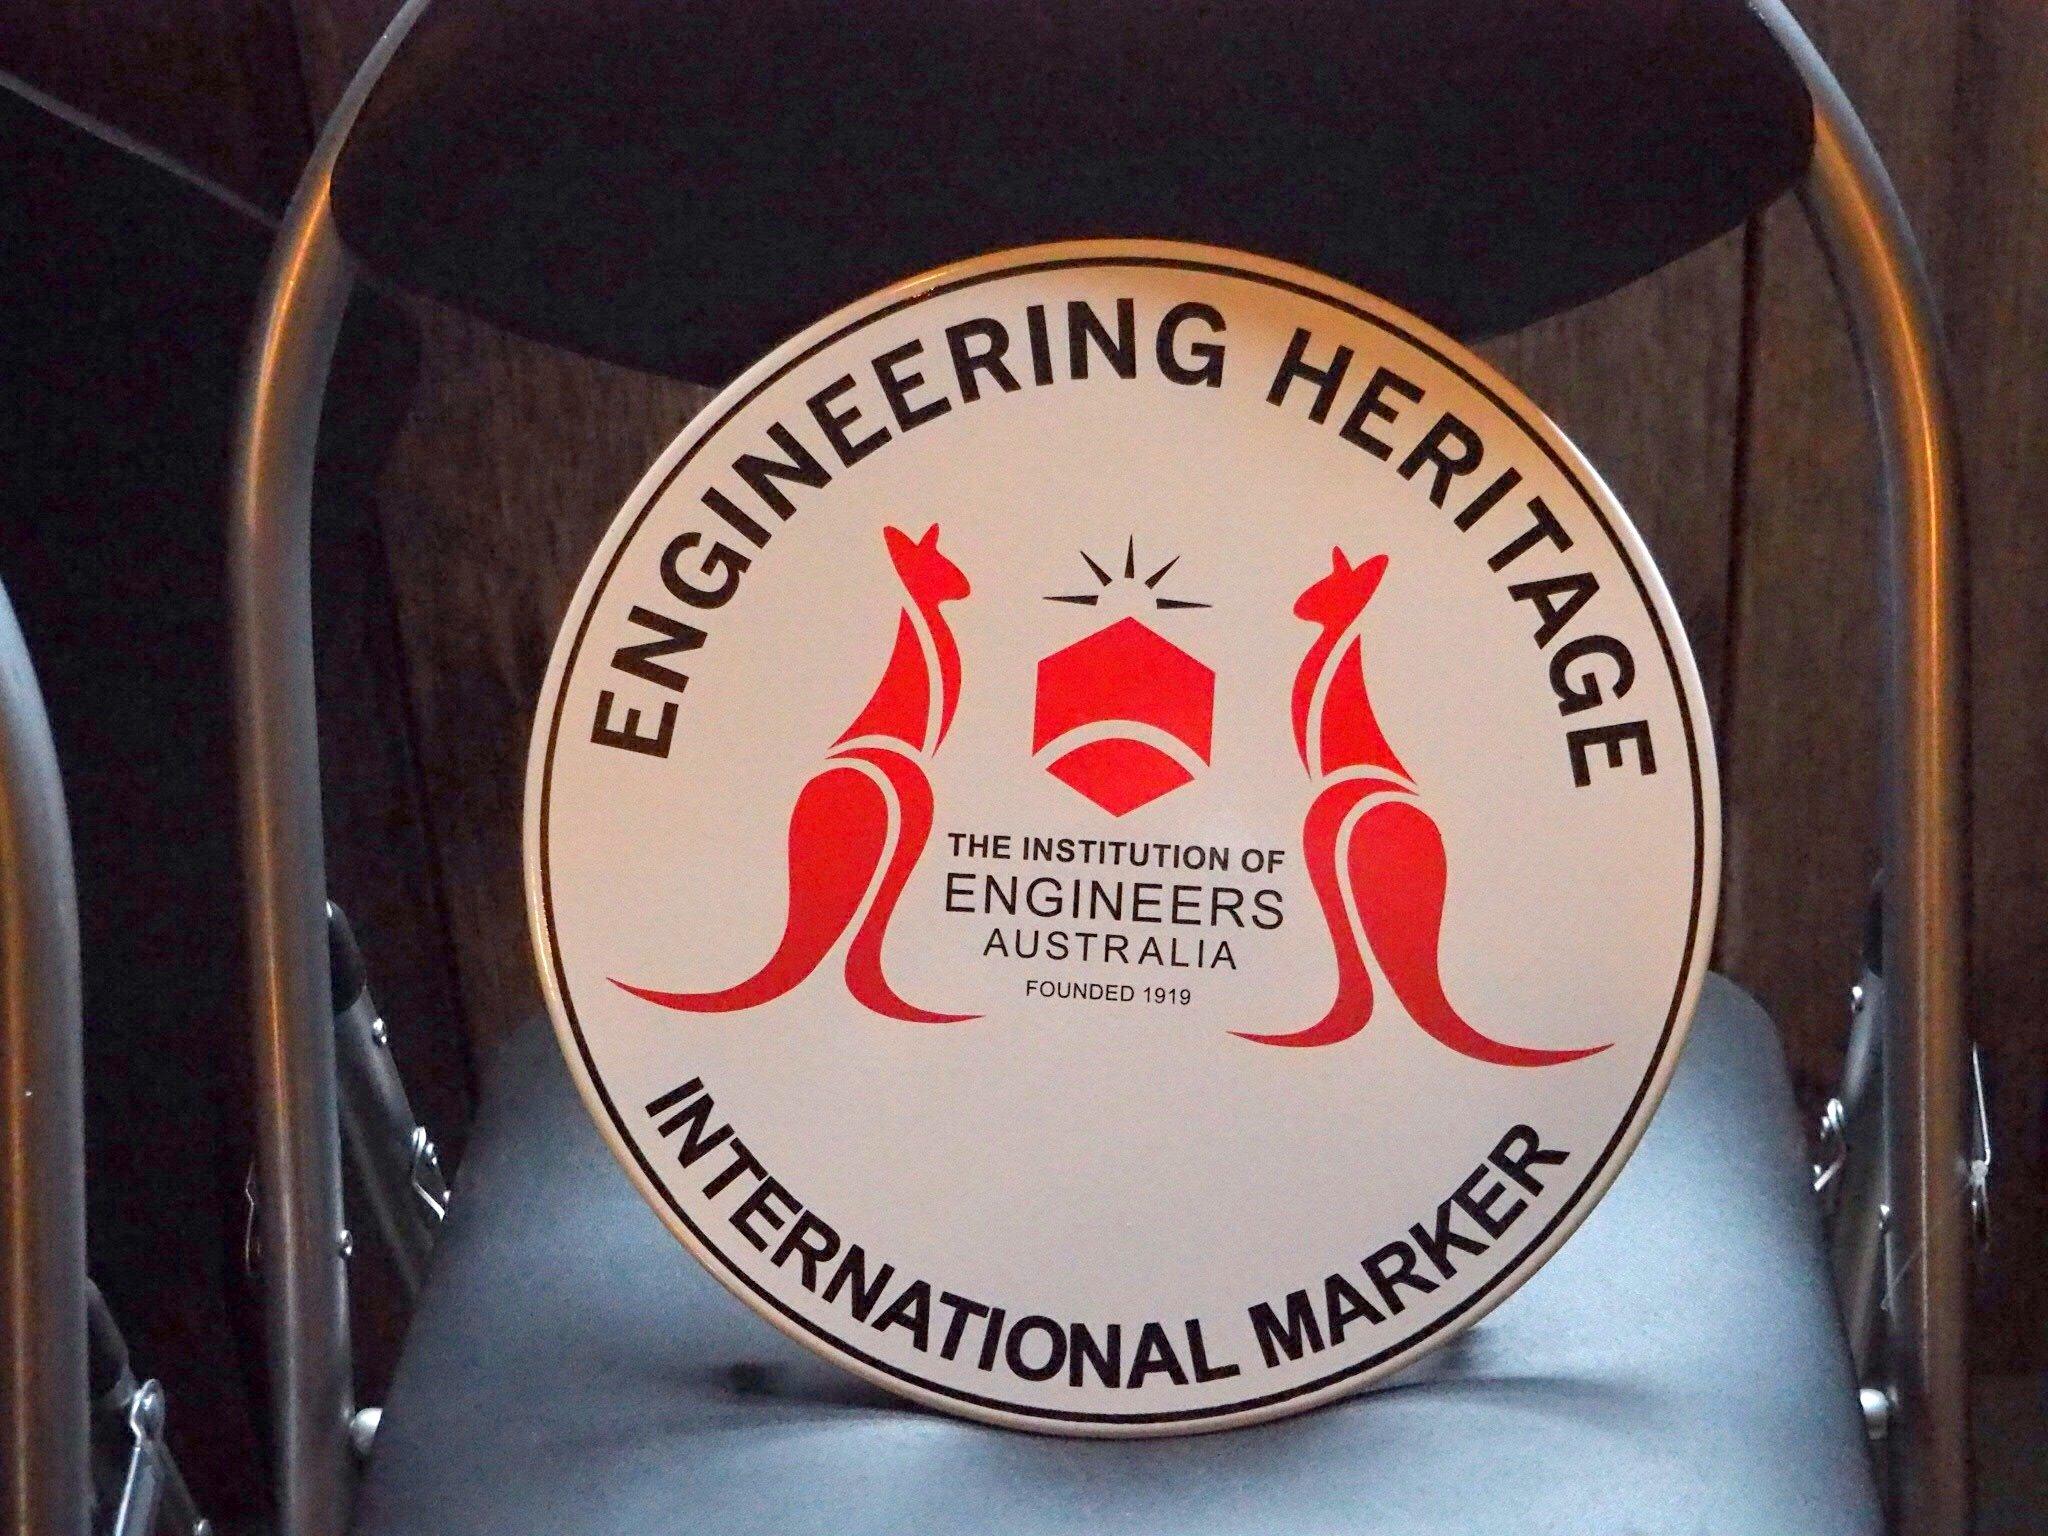 Engineering Heritage International Marker